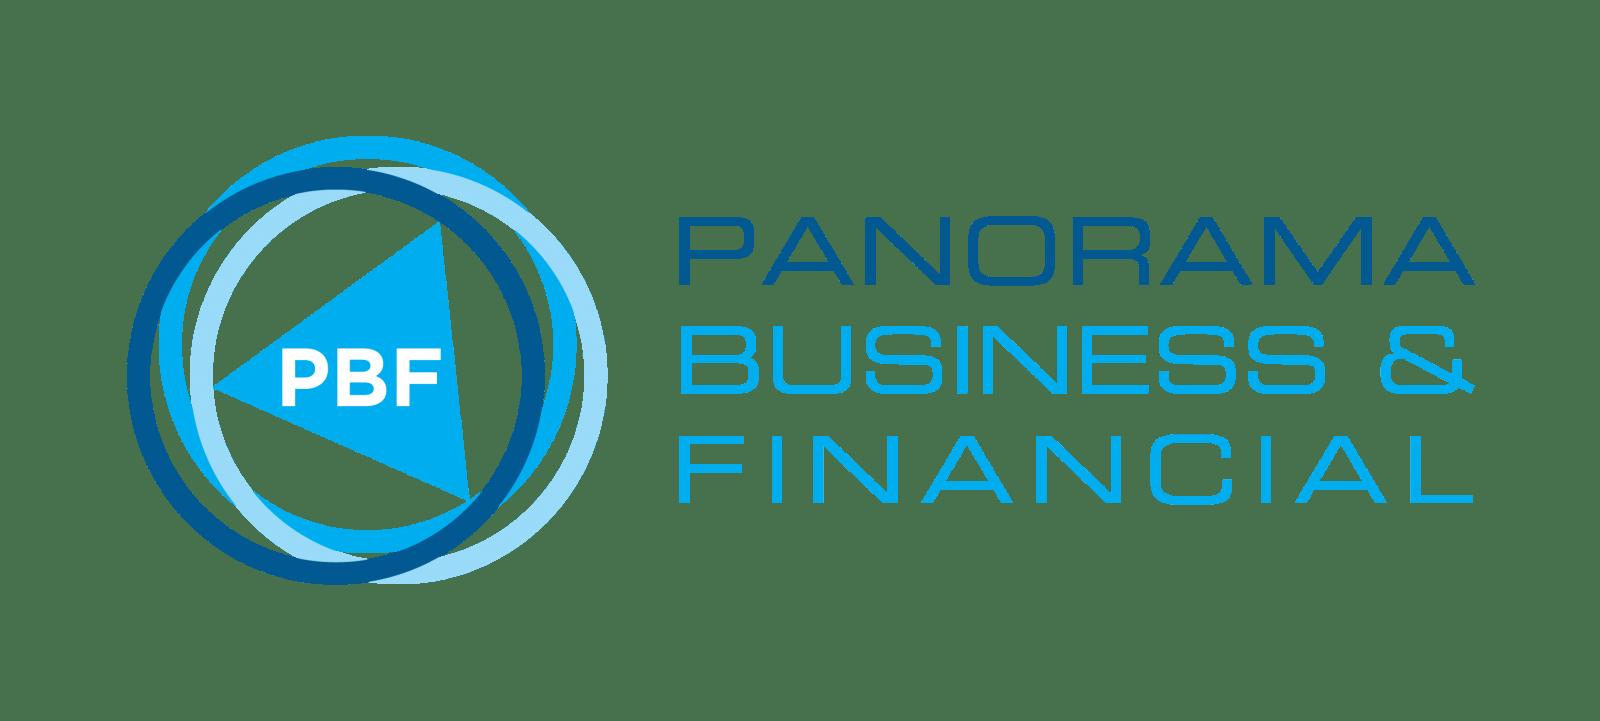 Panorama Business & Financial, Bathurst